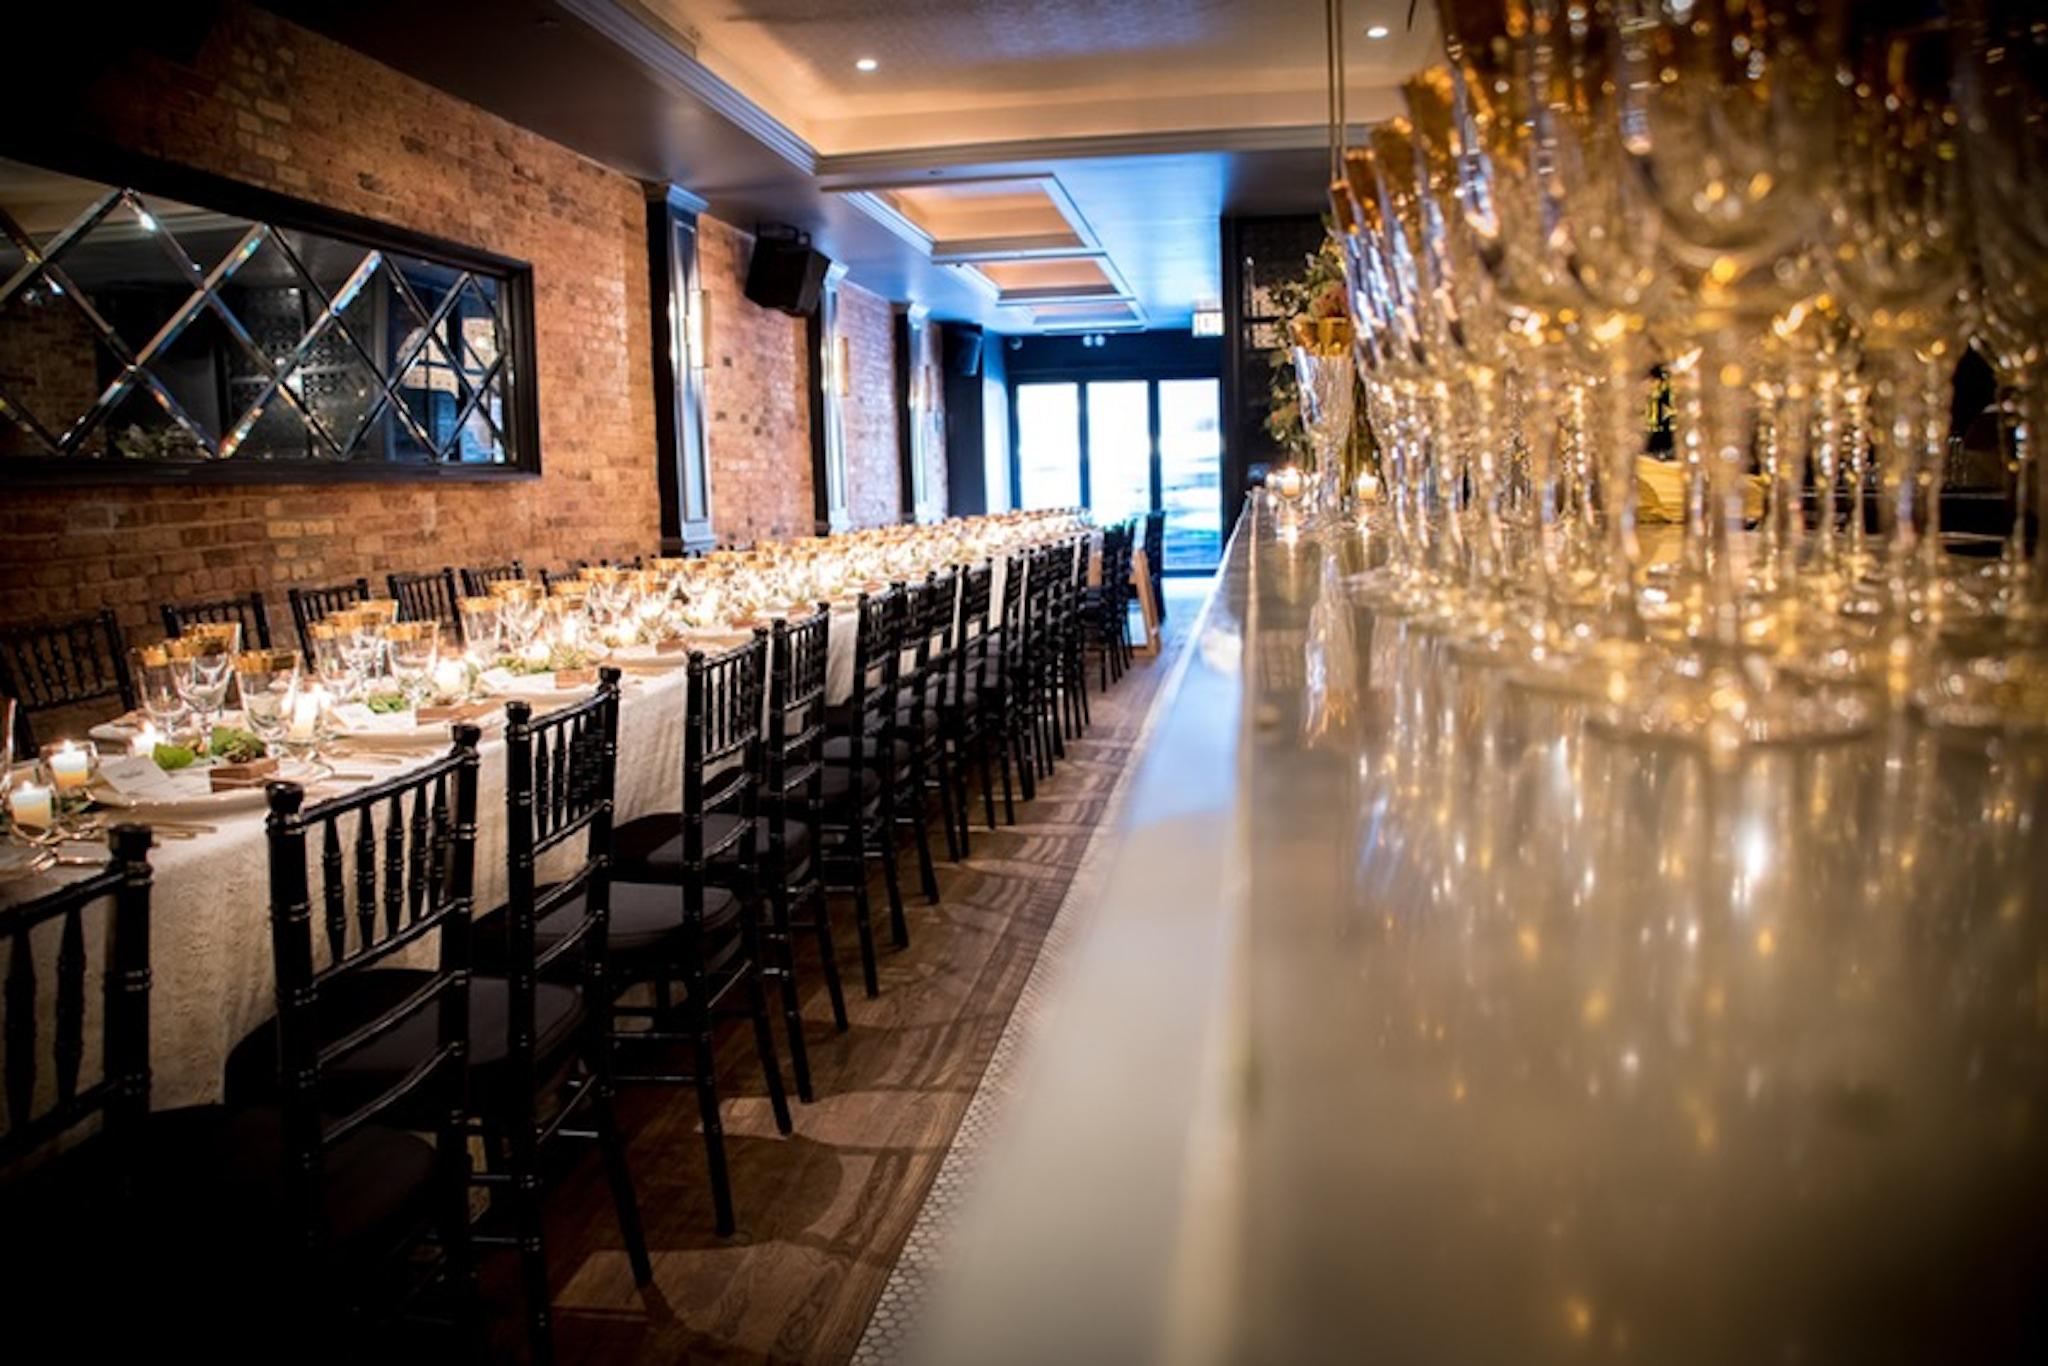 Chicago wedding venues for a rehearsal dinner - Celeste